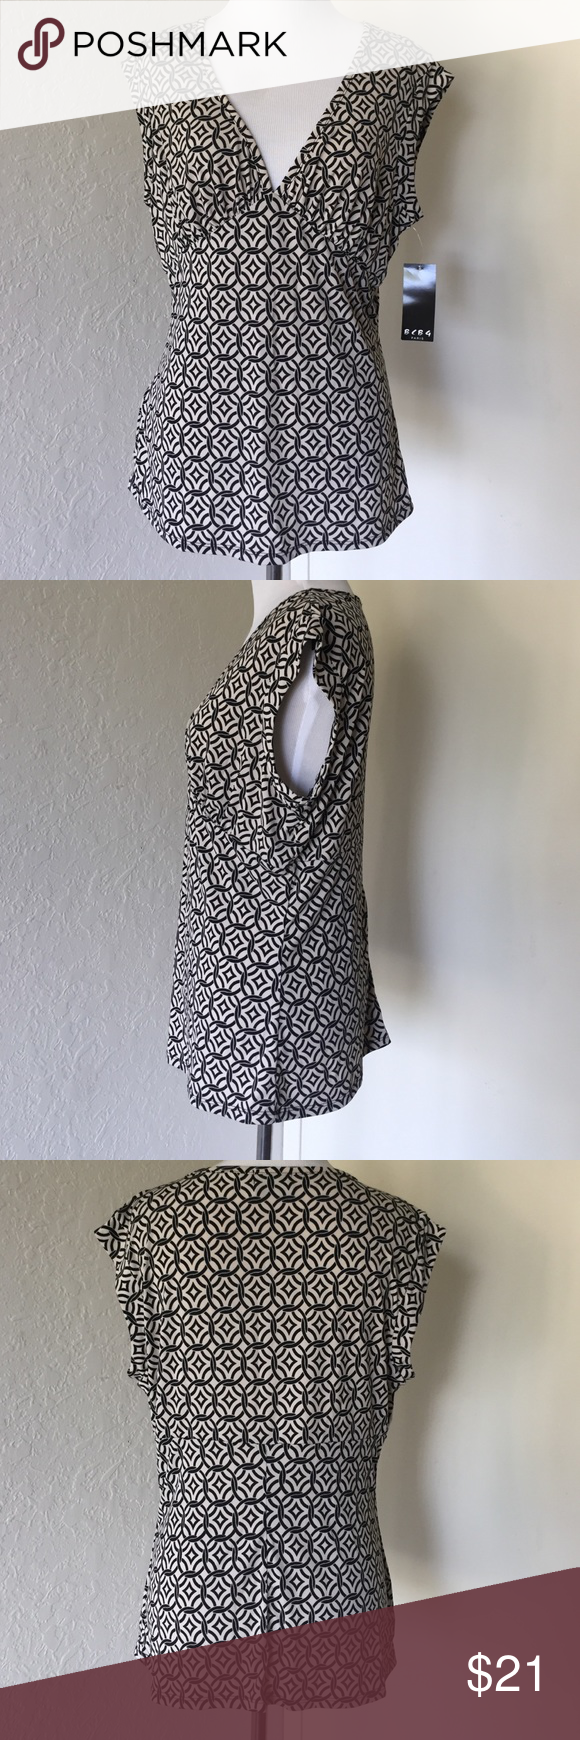 BCBG Sleeveless V-Neck Top Excellent condition. Knit Too. Matte Jersey. BCBG Tops